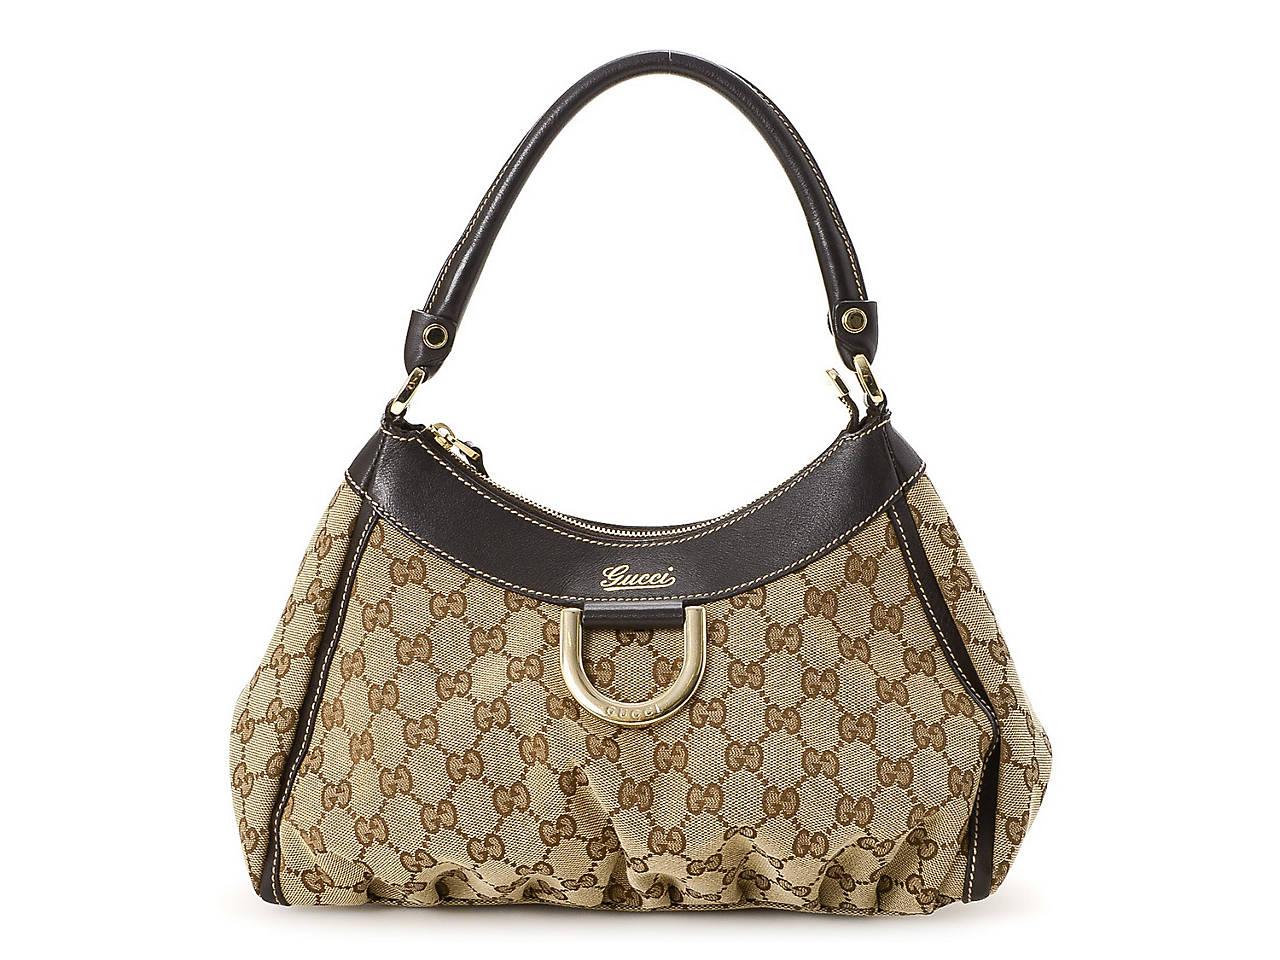 9b2a6452c9c Gucci - Vintage Luxury GG Canvas D-Gold Hobo Bag Women s Handbags ...